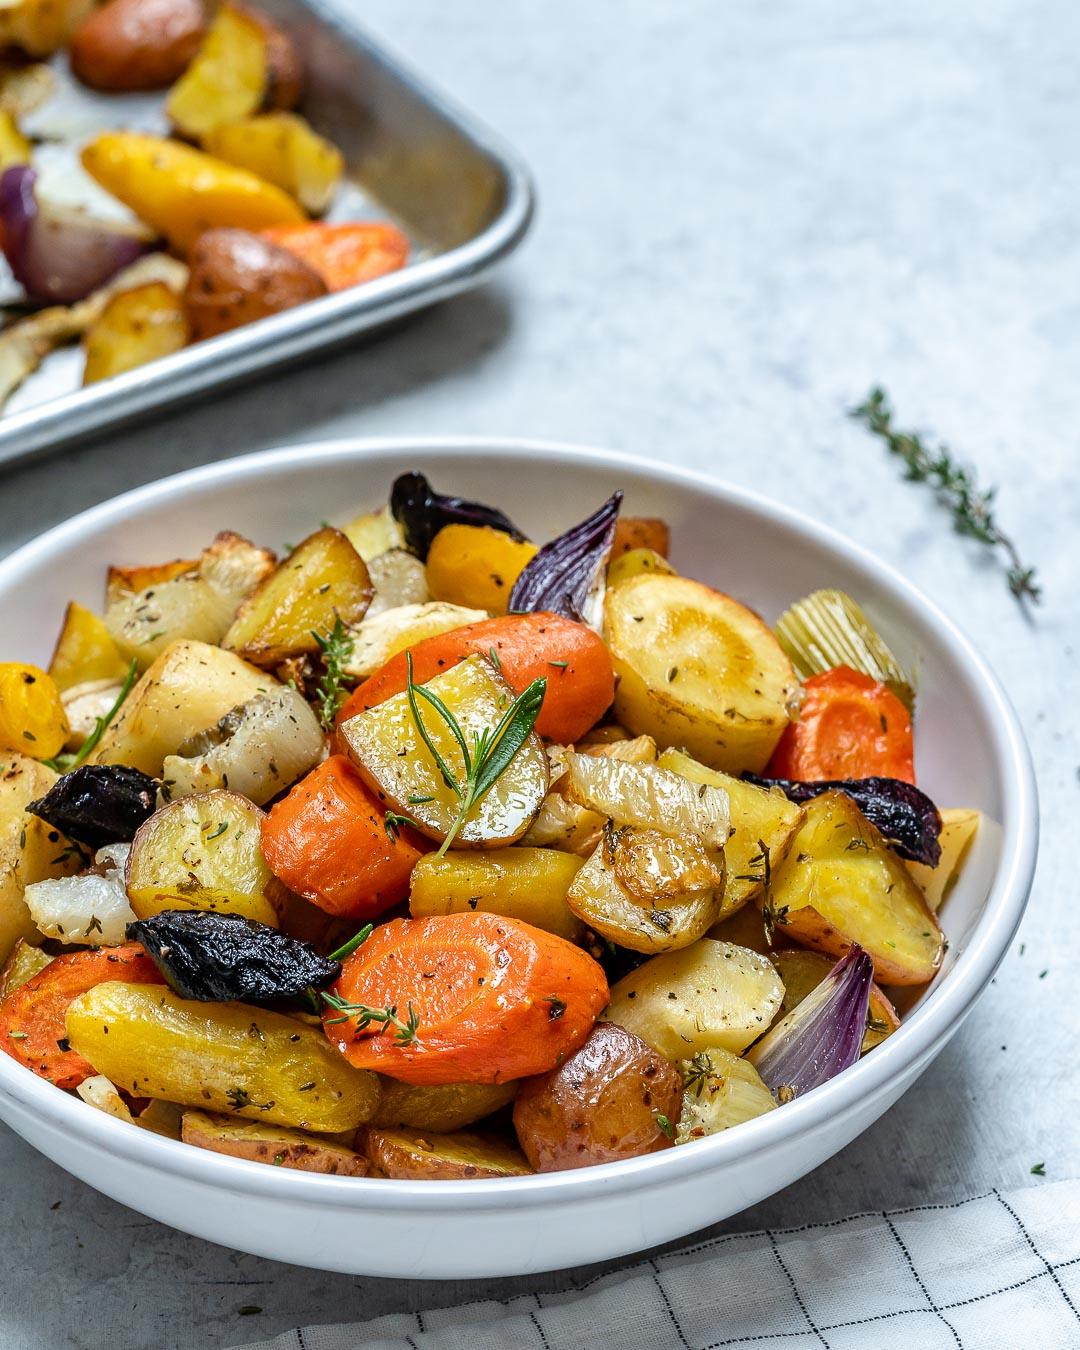 Eat Clean Rosemary Roasted Root Vegetables Clean Food Crush